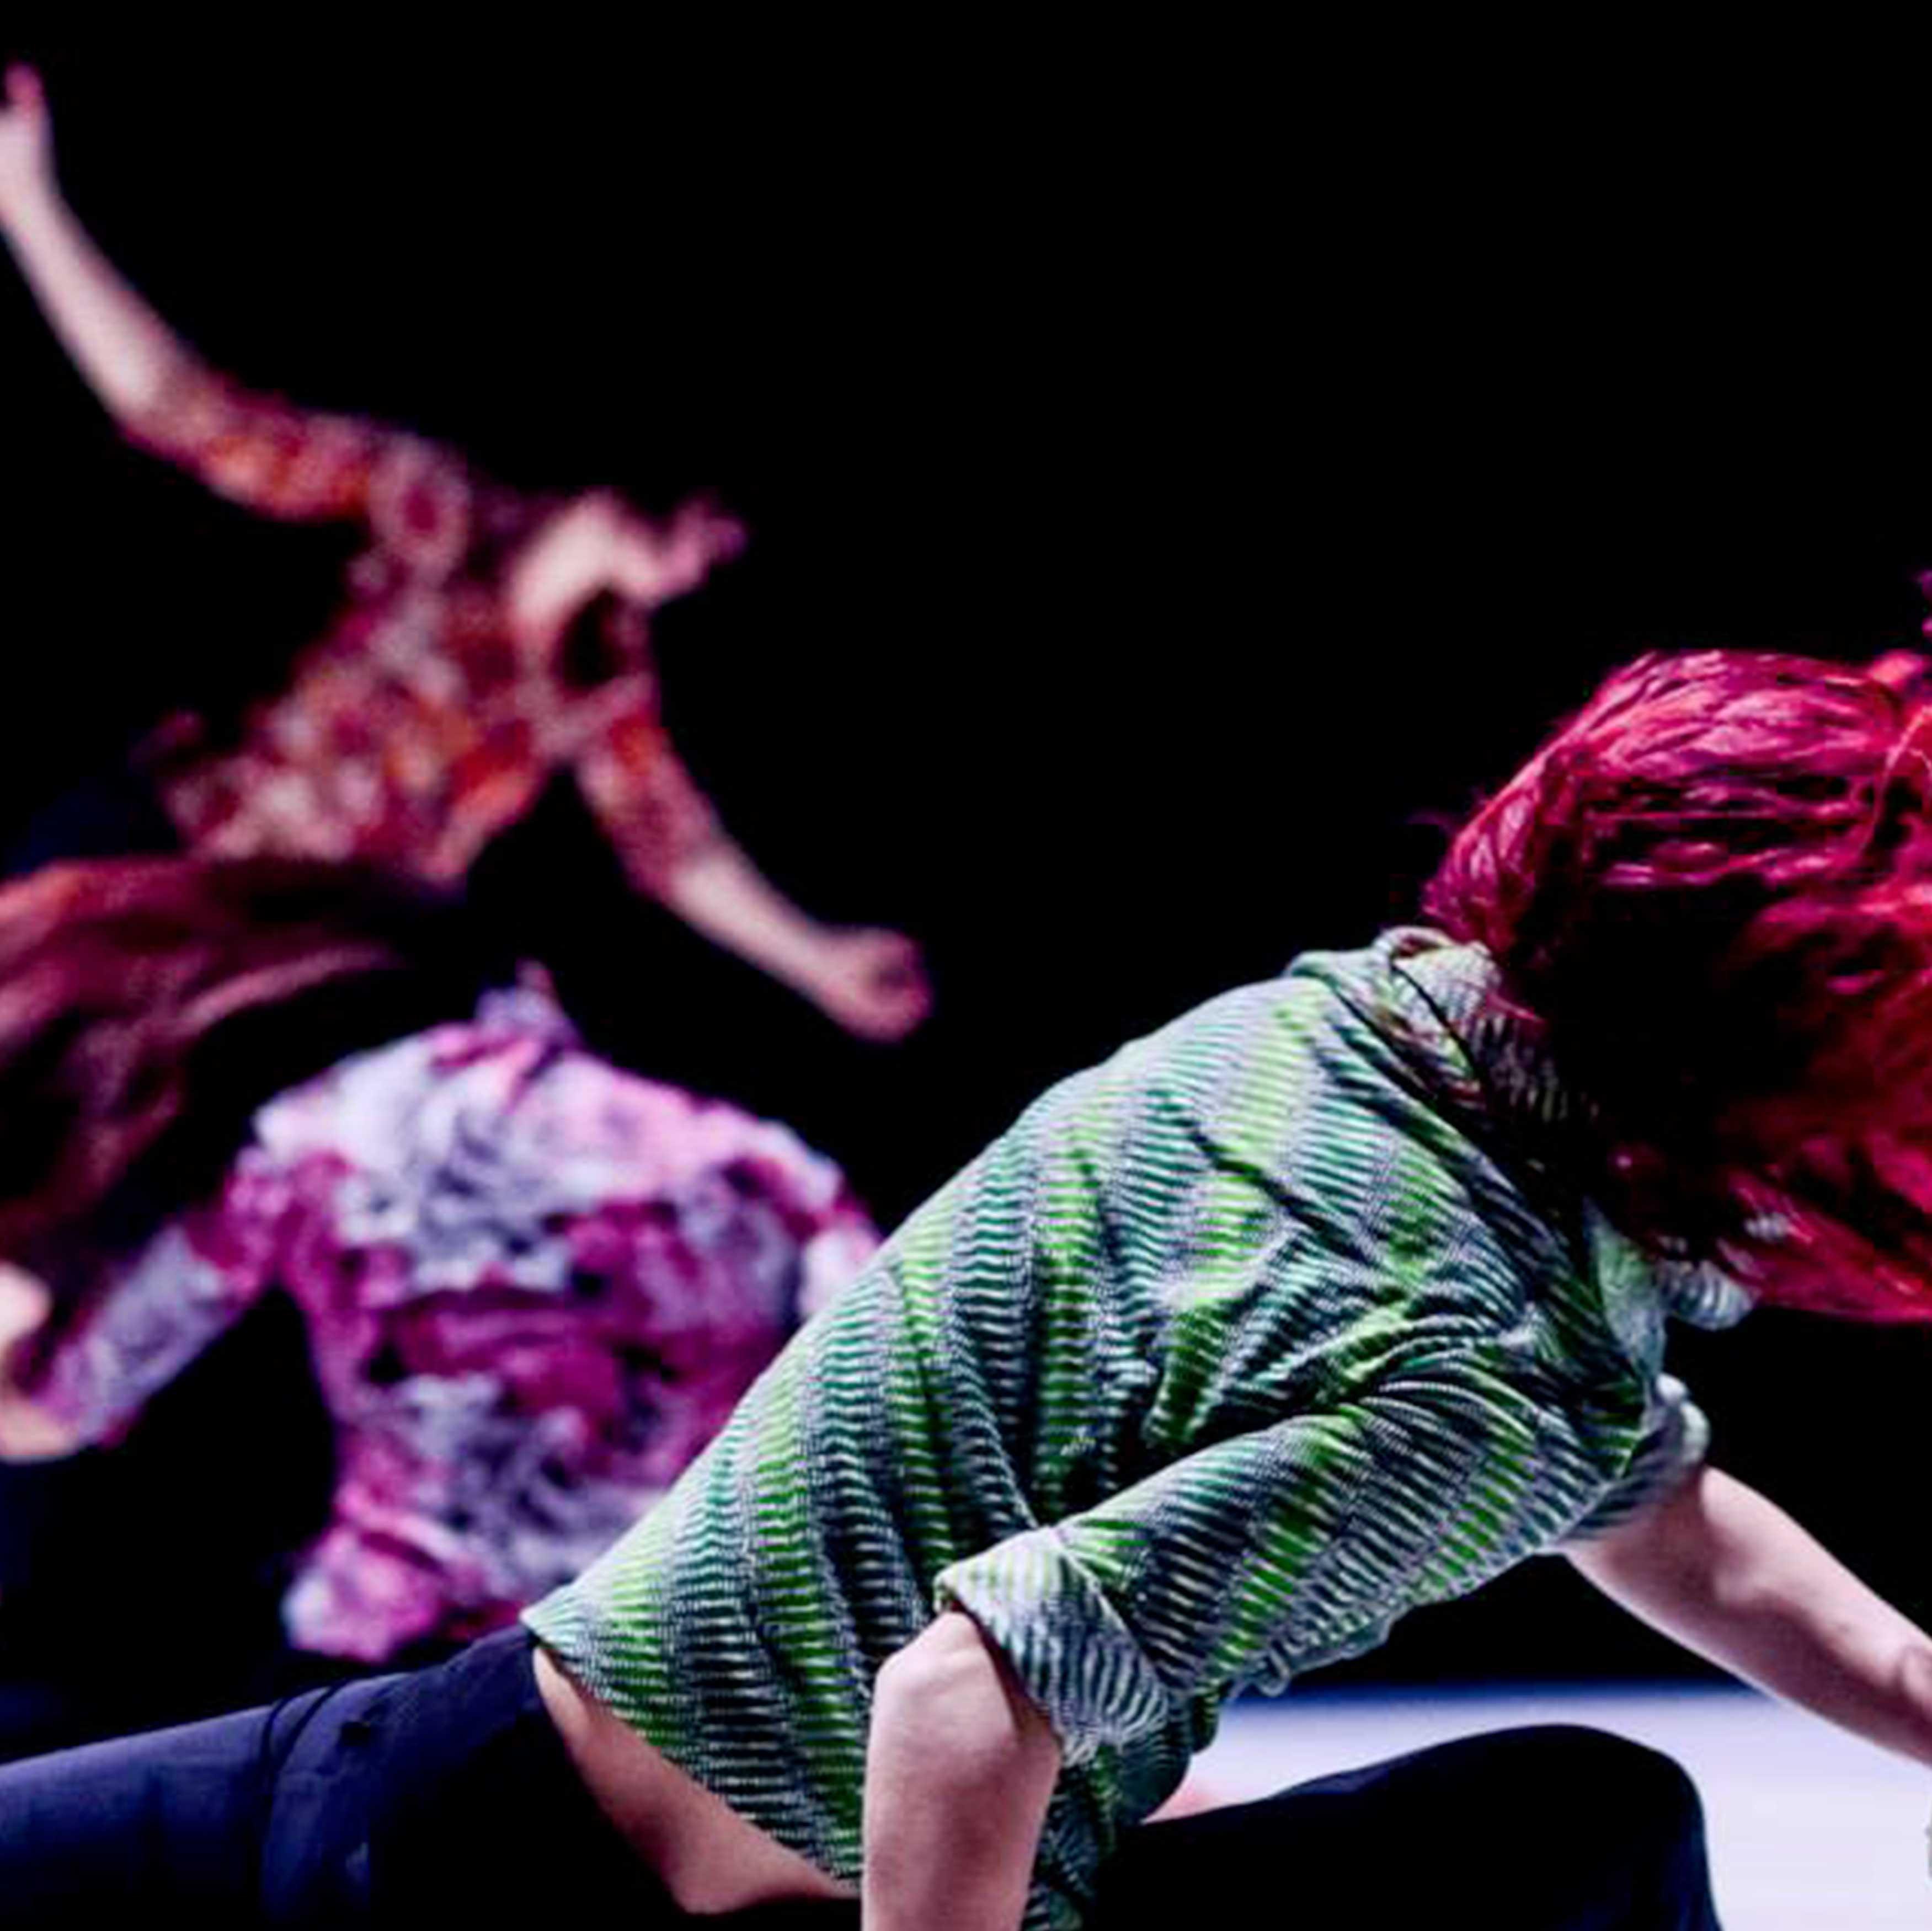 Compagnia-Gabriella-Secchi---Florence-Dance-Center - Firenze